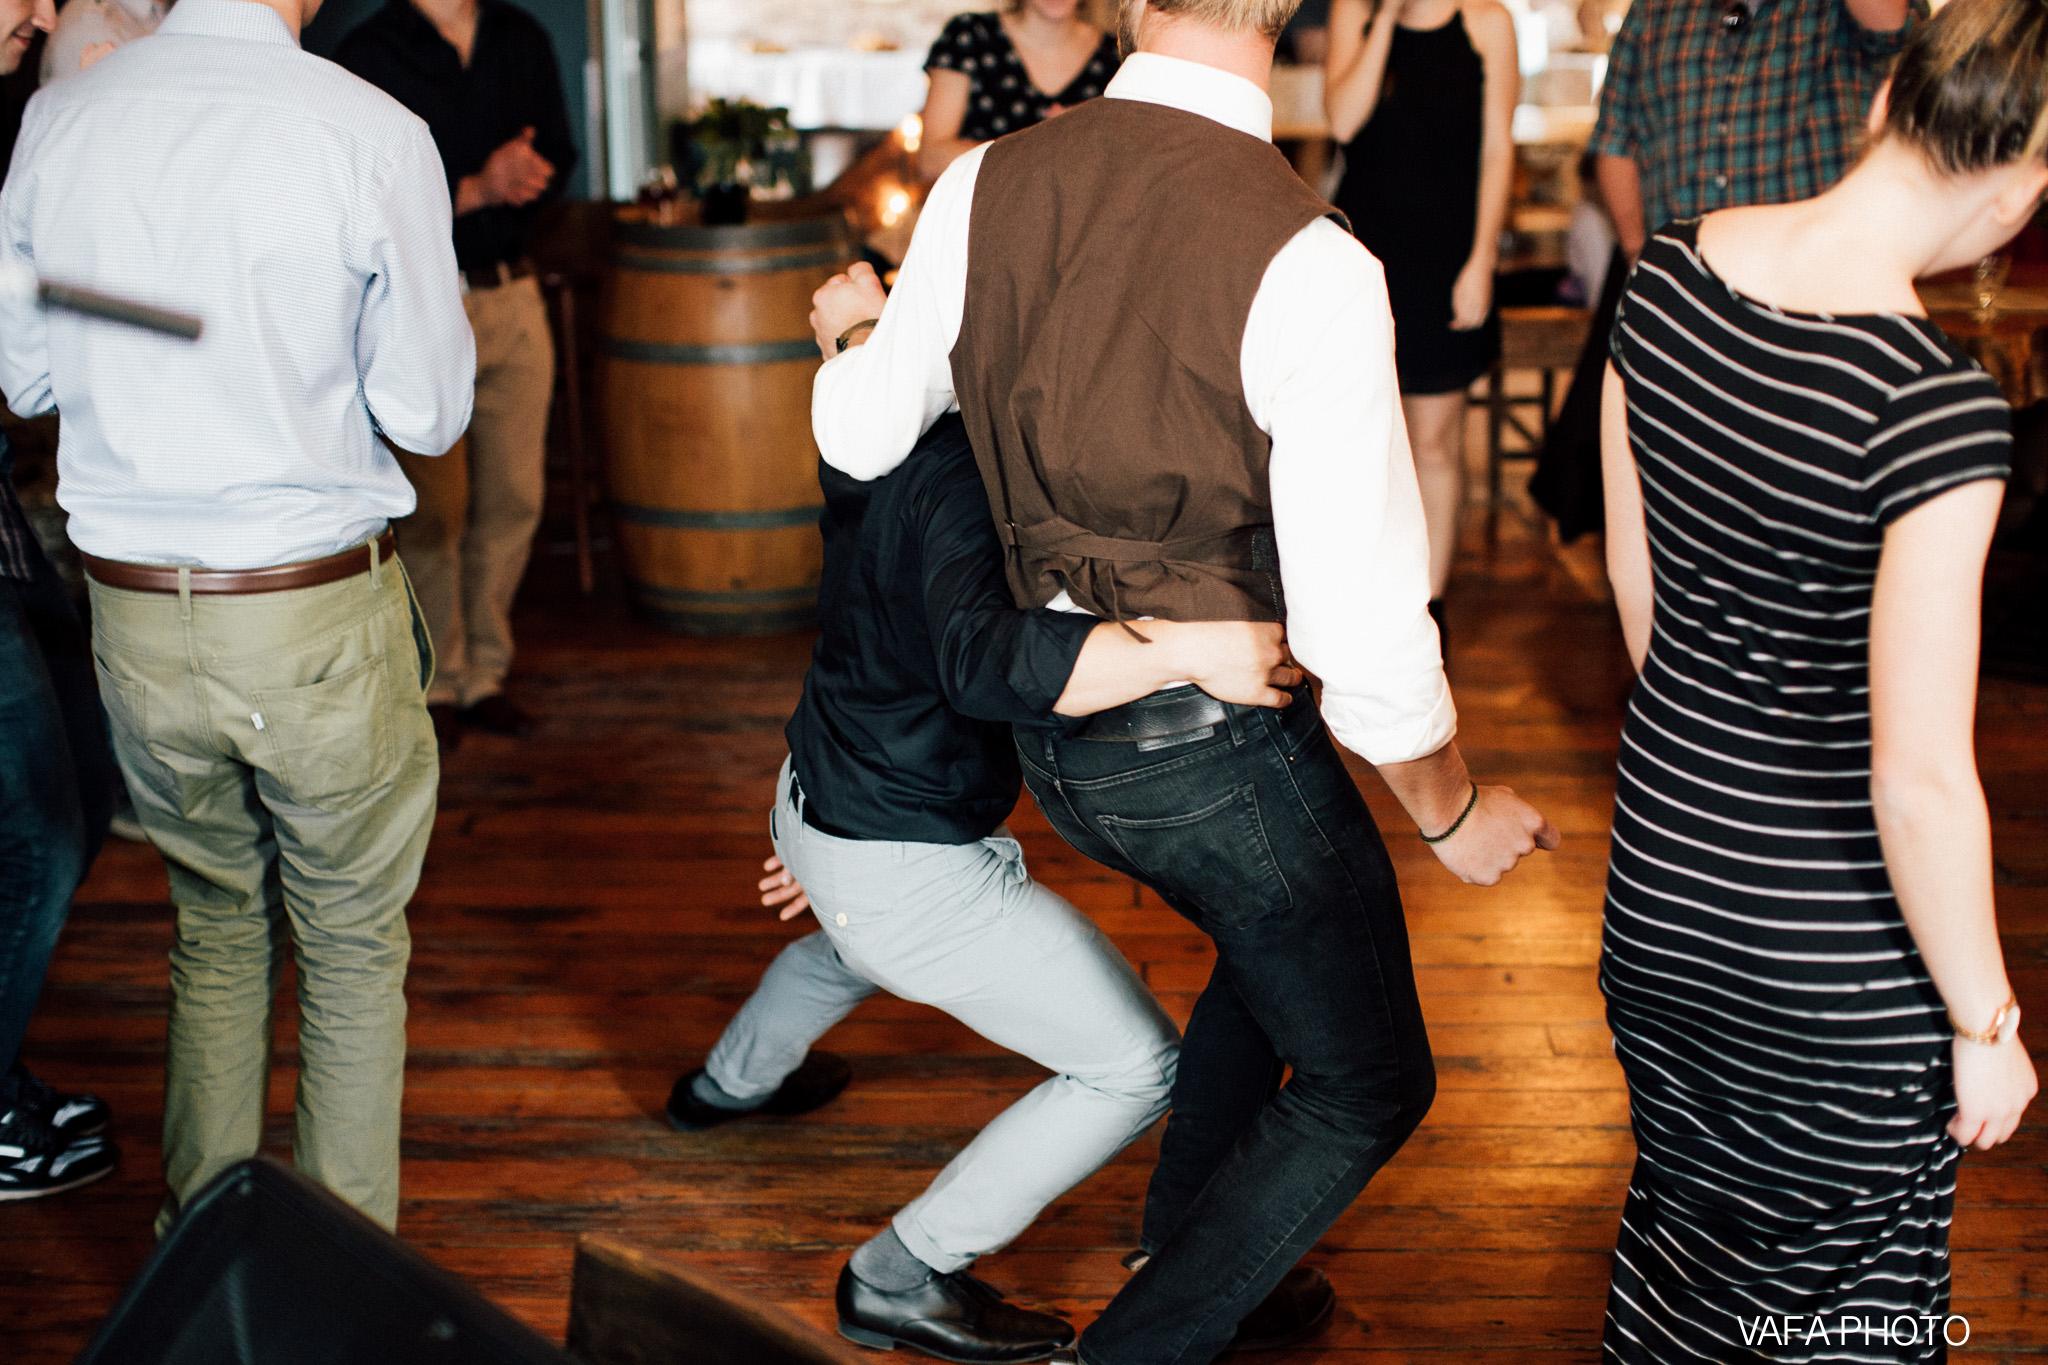 Hogback-Mountain-Wedding-Chelsea-Josh-Vafa-Photo-874.jpg